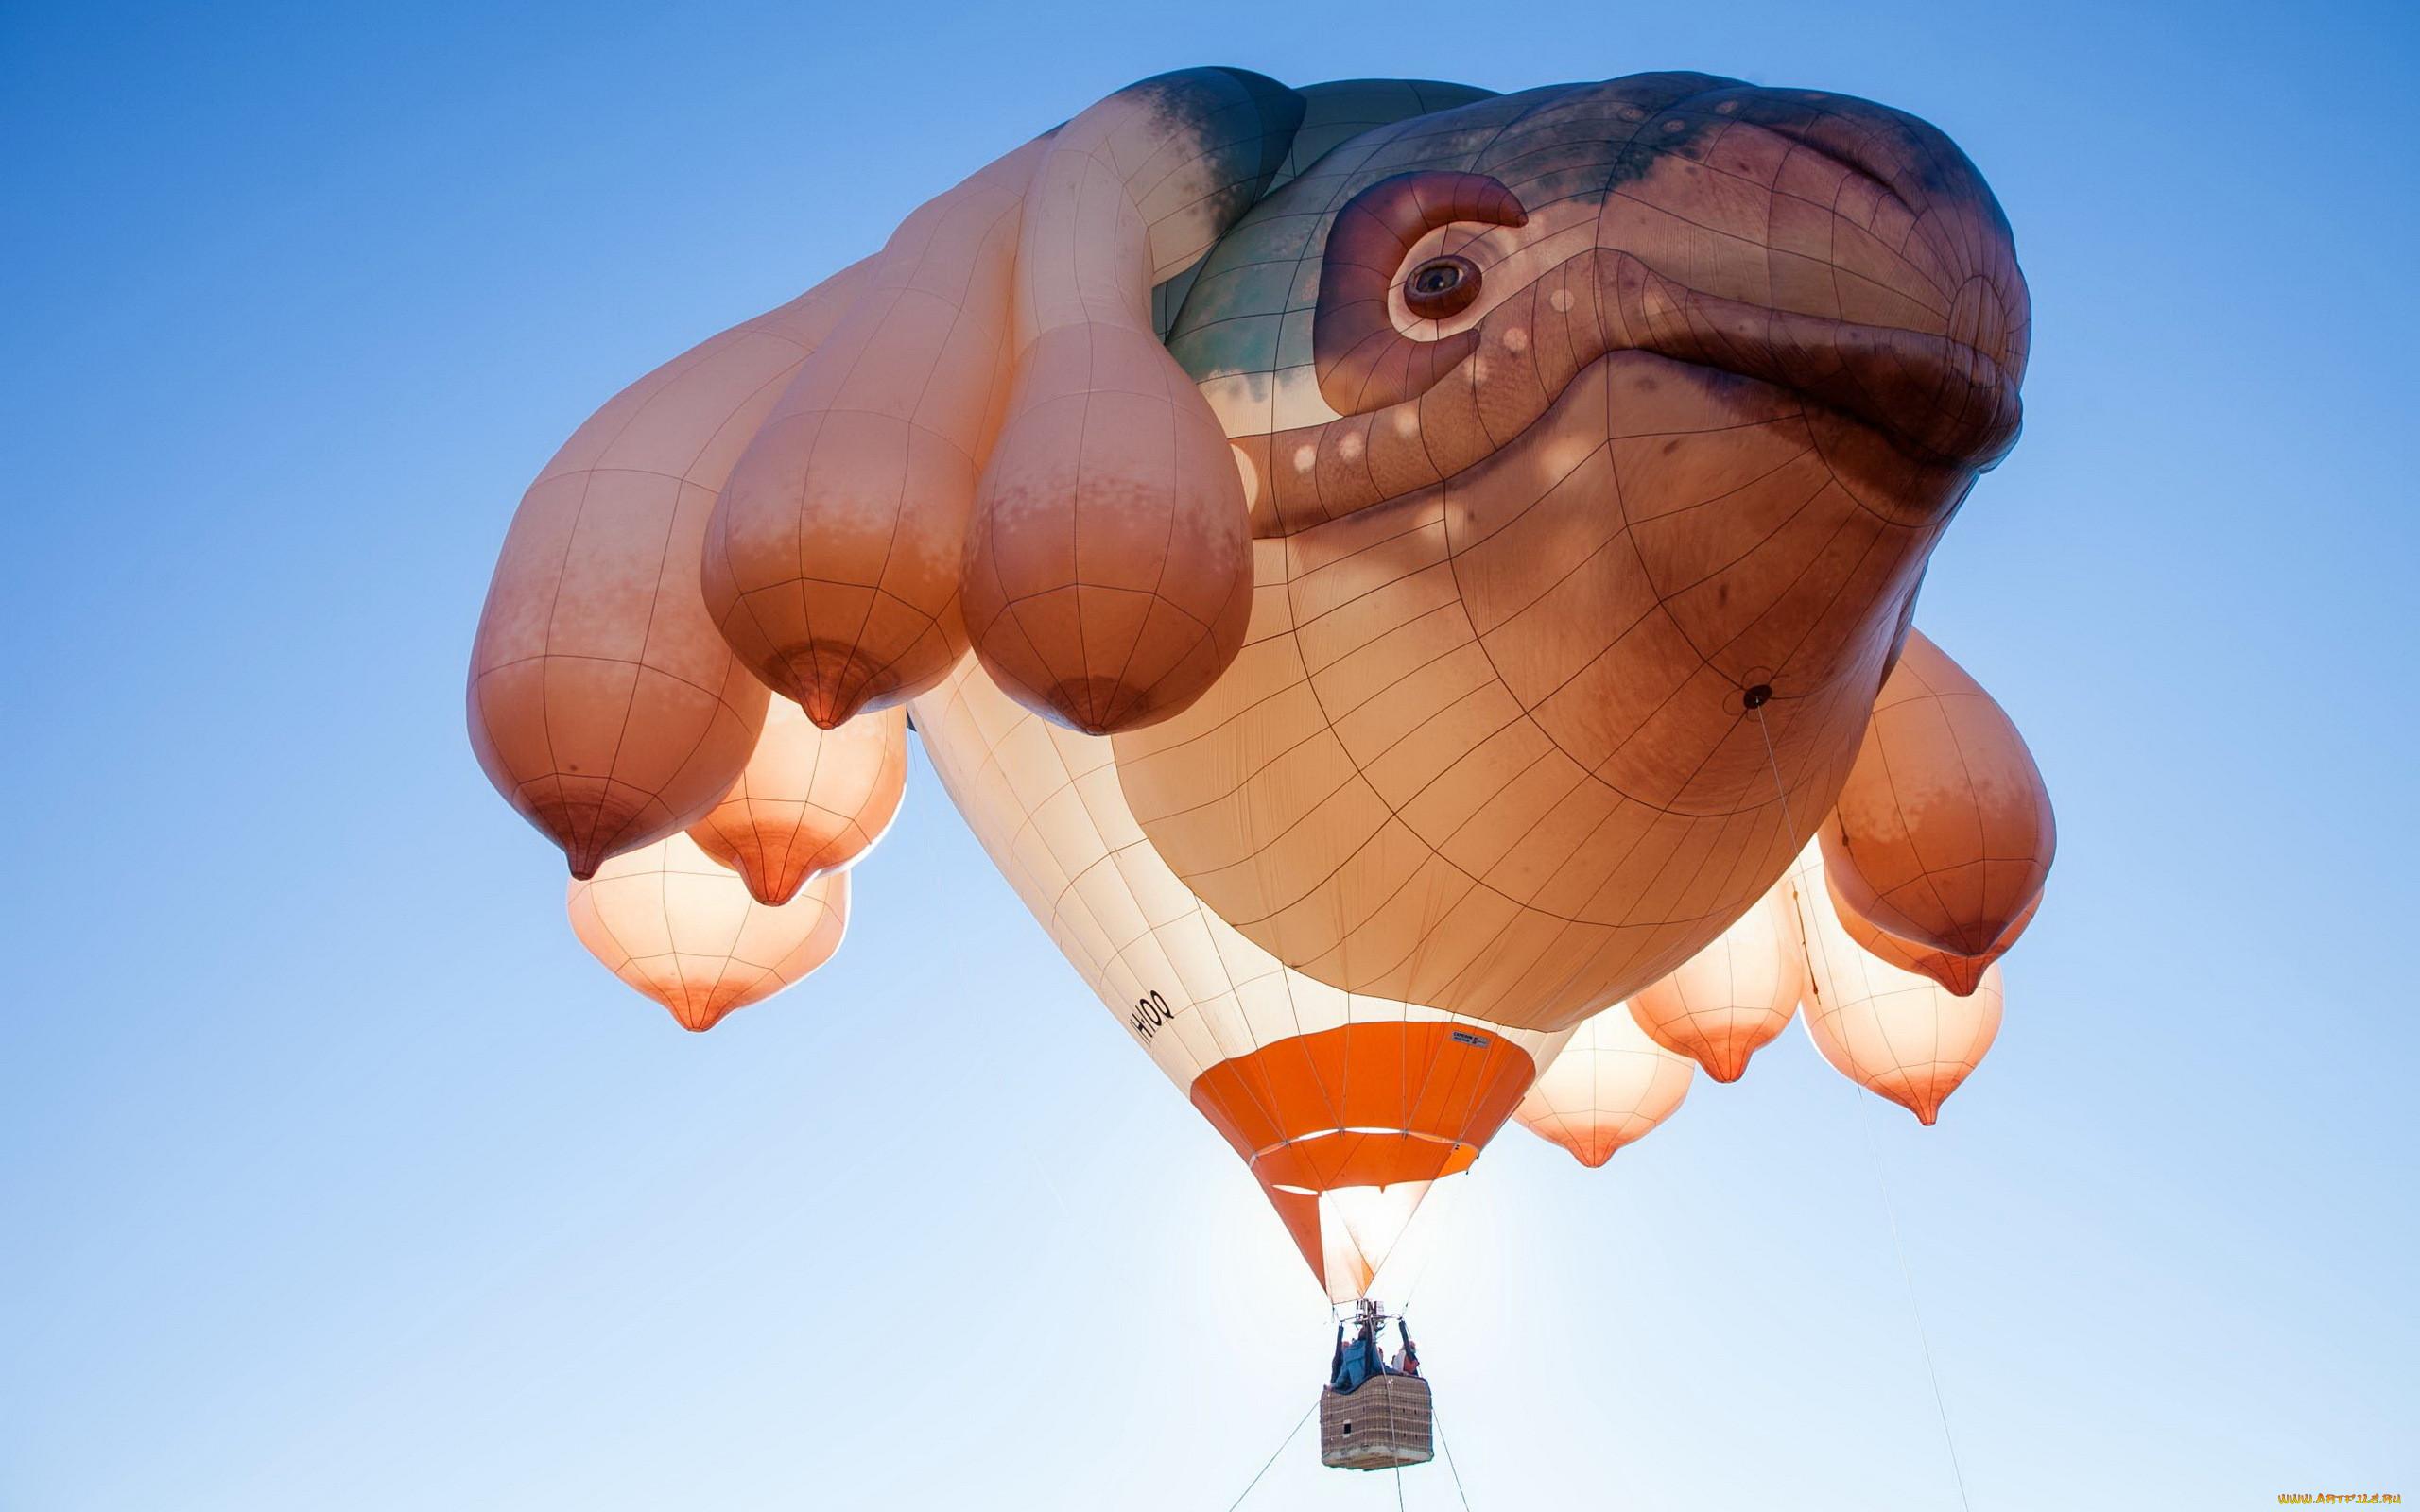 Обои воздушный шар, корзина. Авиация foto 13